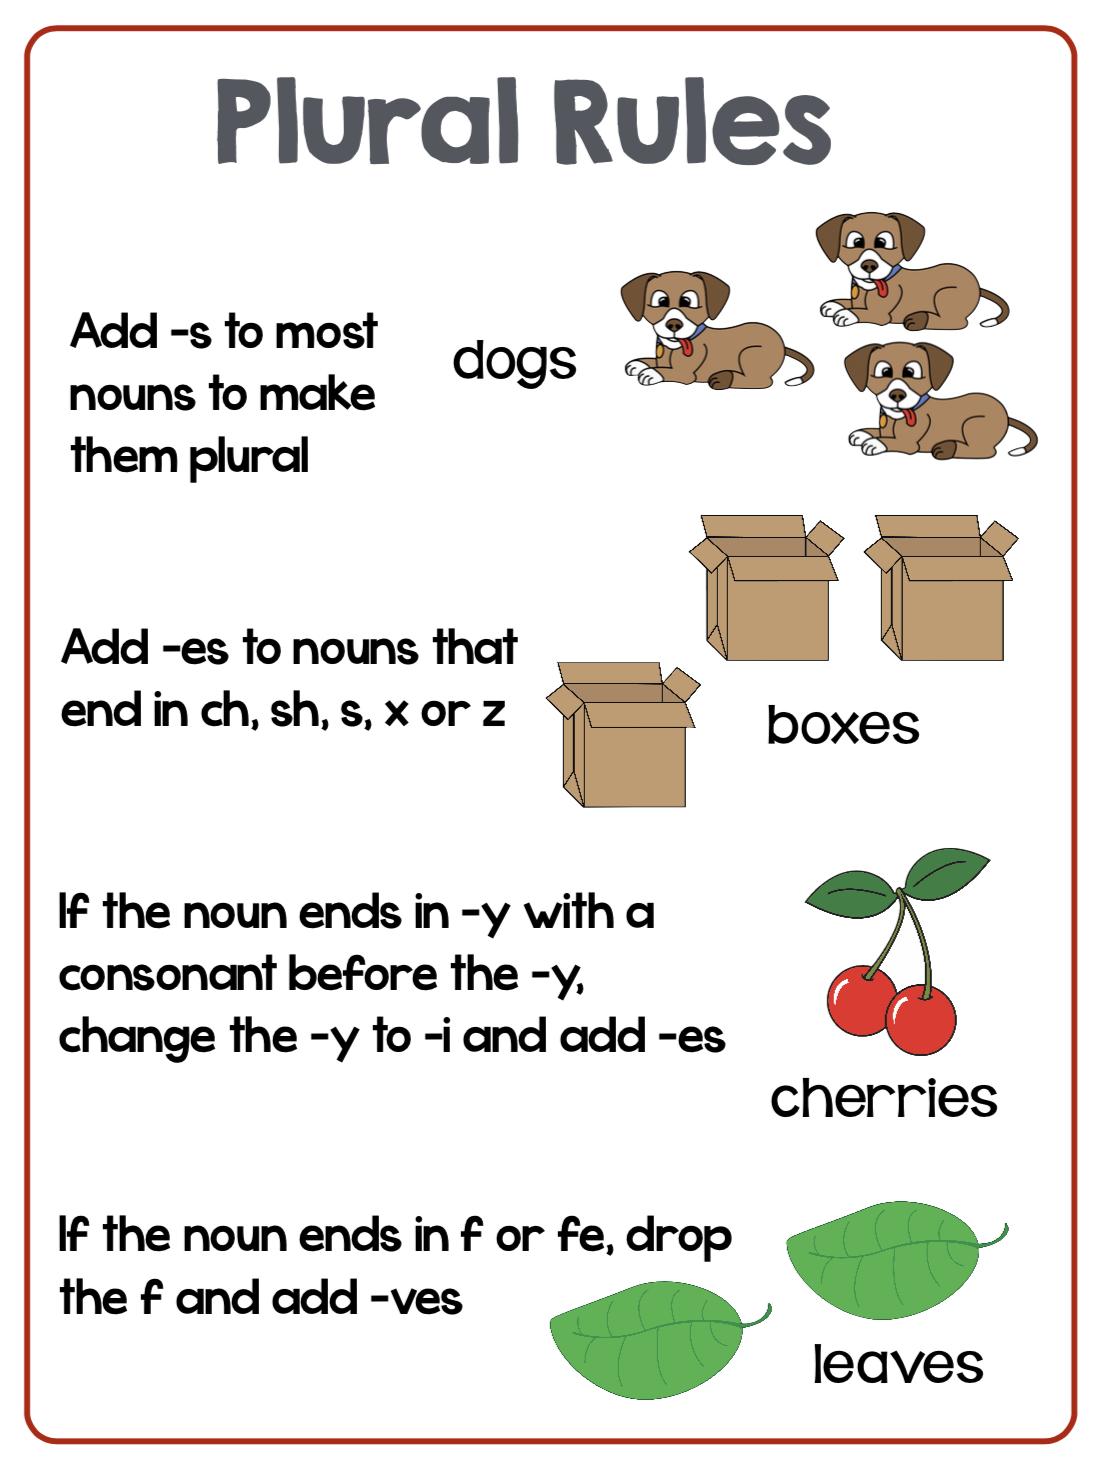 File Folder Phonics - Teaching Plurals - Make Take & Teach